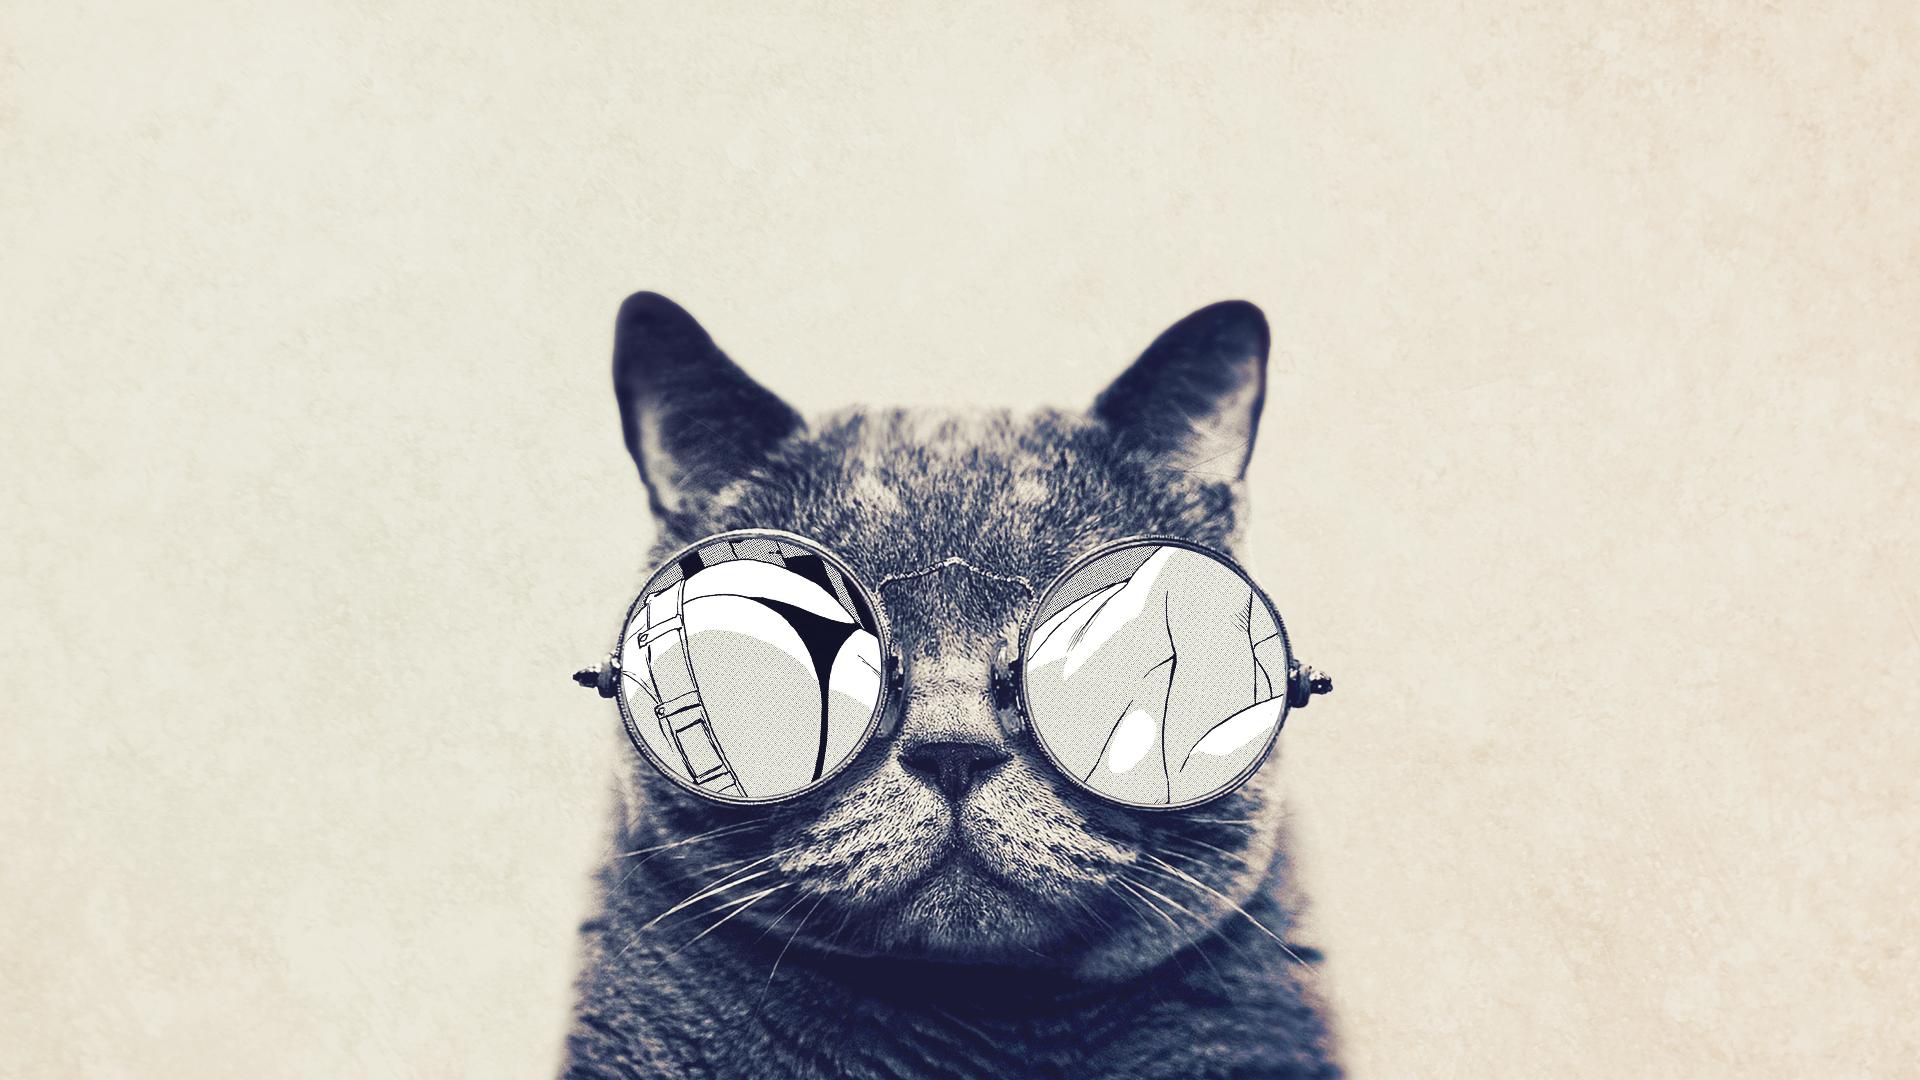 Cat with Glasses   Nexus Wallpaper 1920x1080